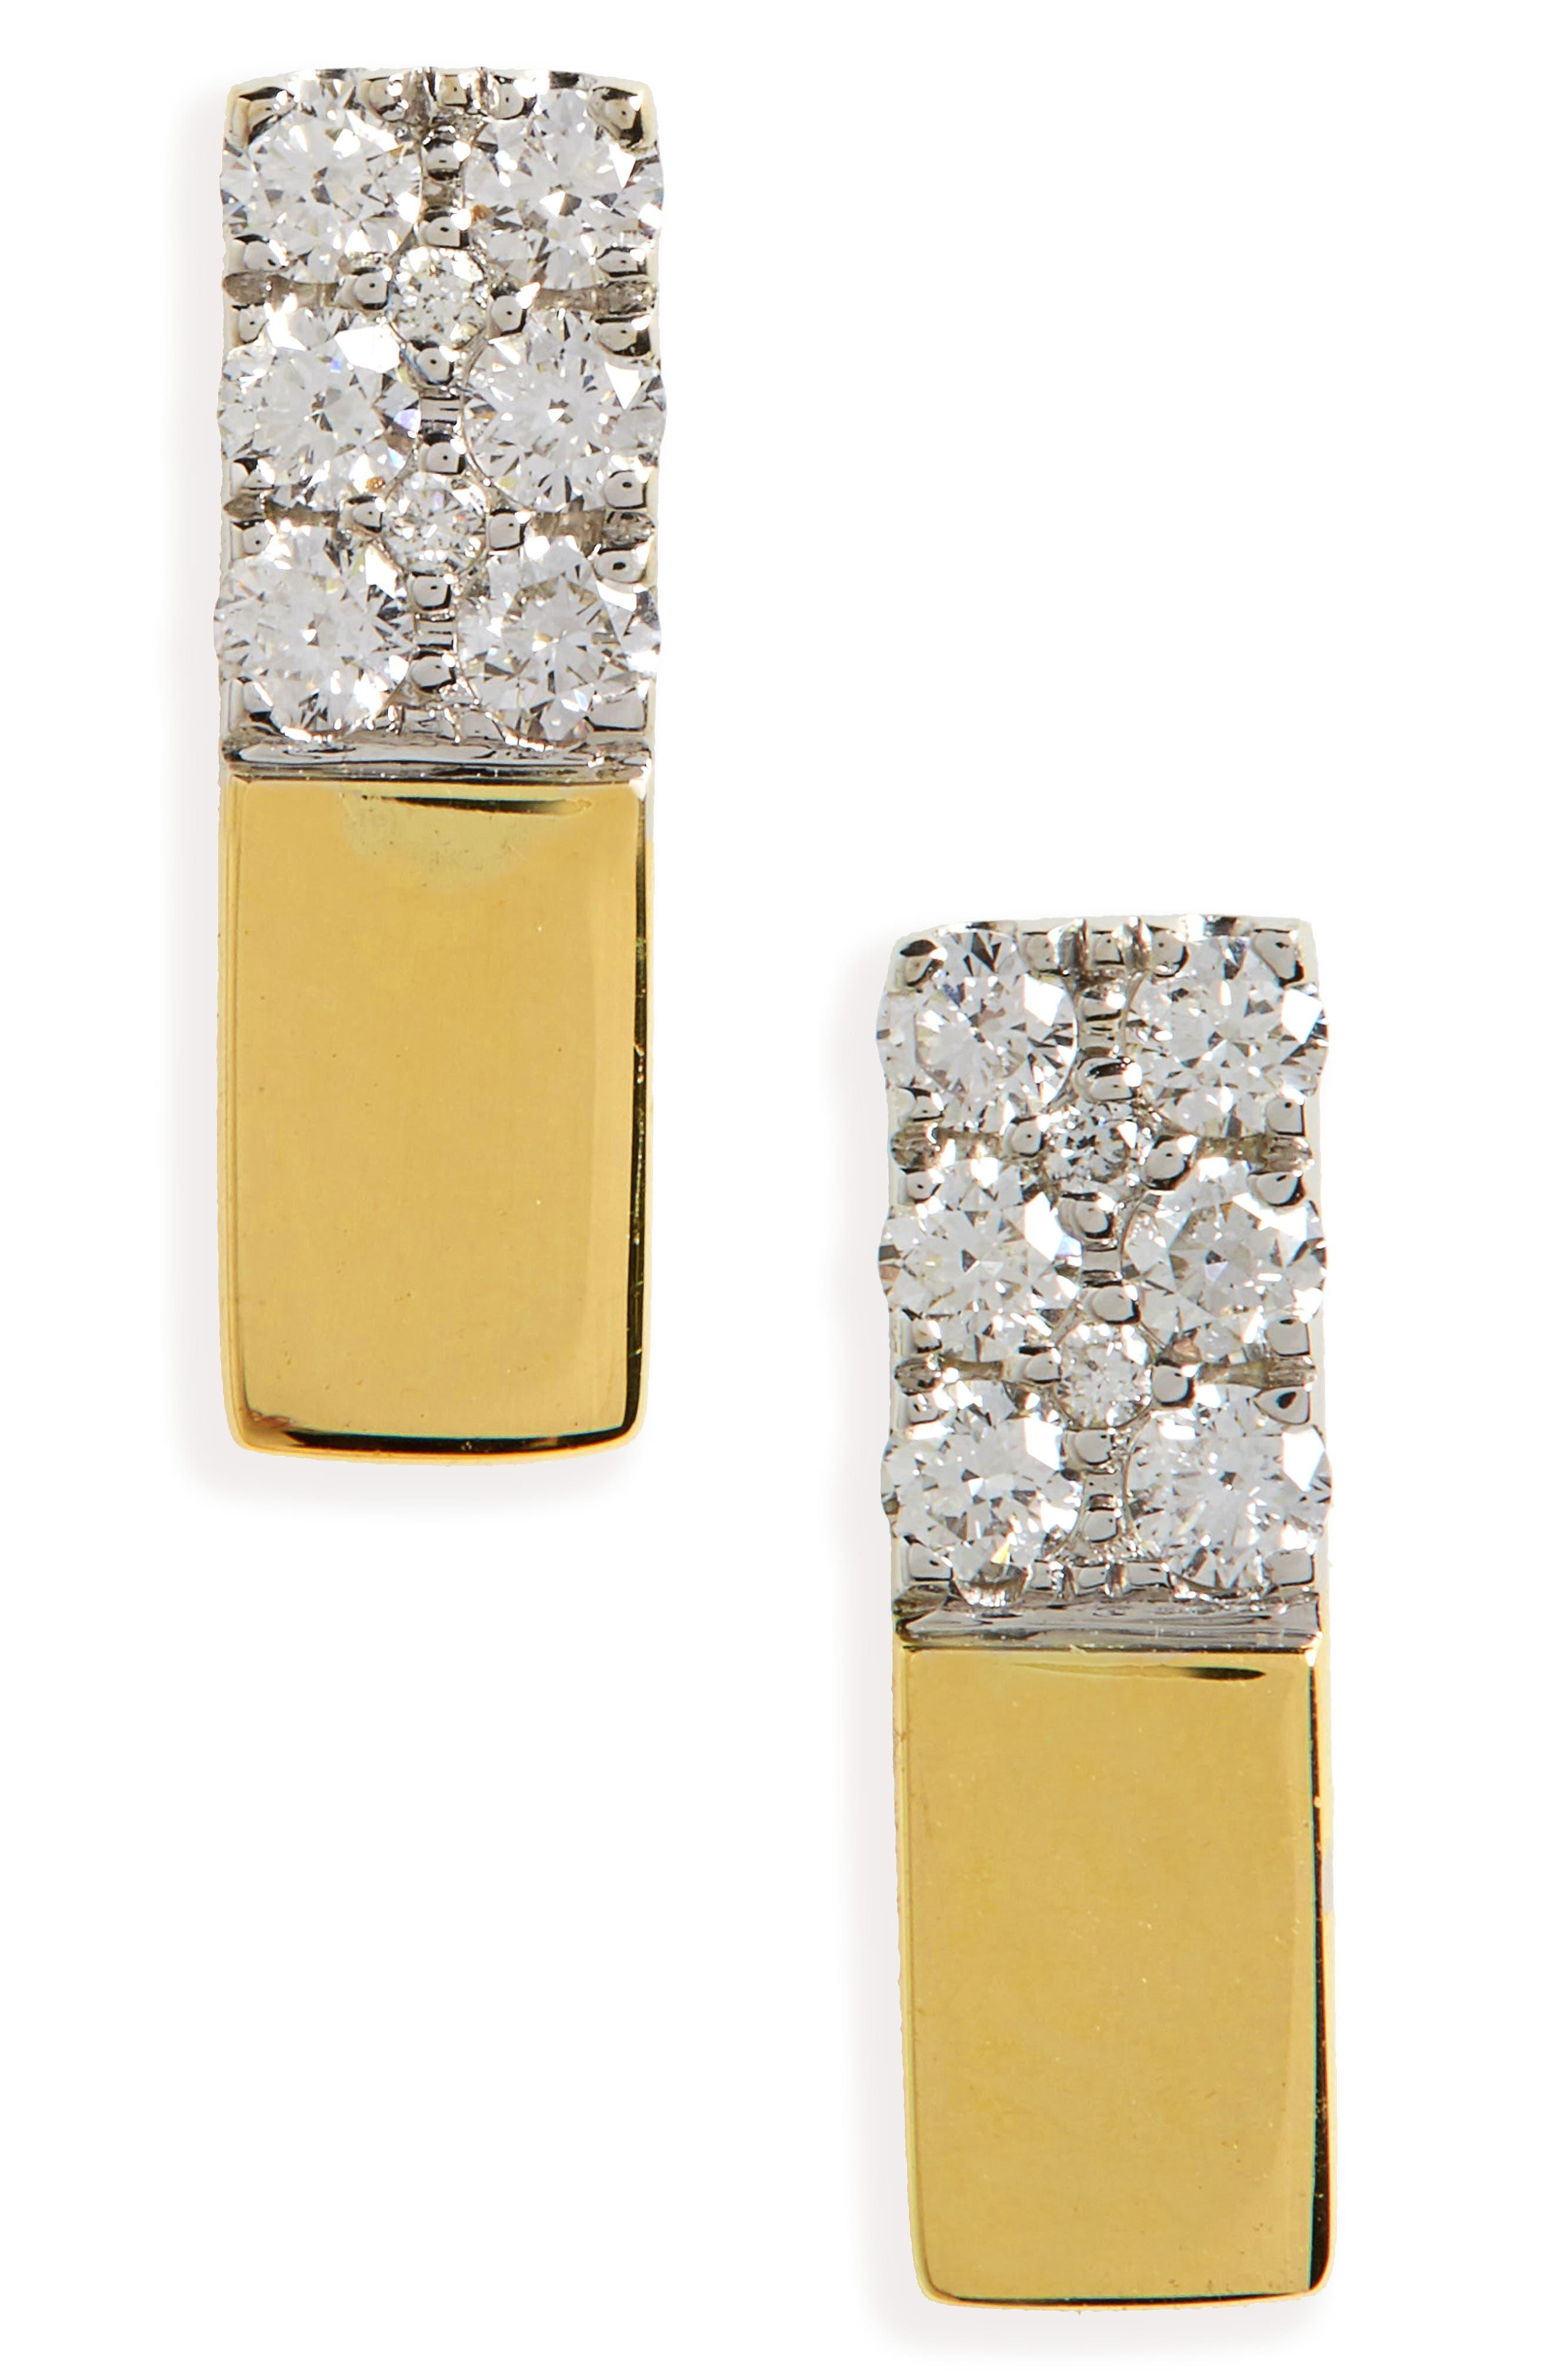 Kiera Diamond & 18K Gold Bar Stud Earrings,                         Main,                         color, Yellow Gold/ White Gold